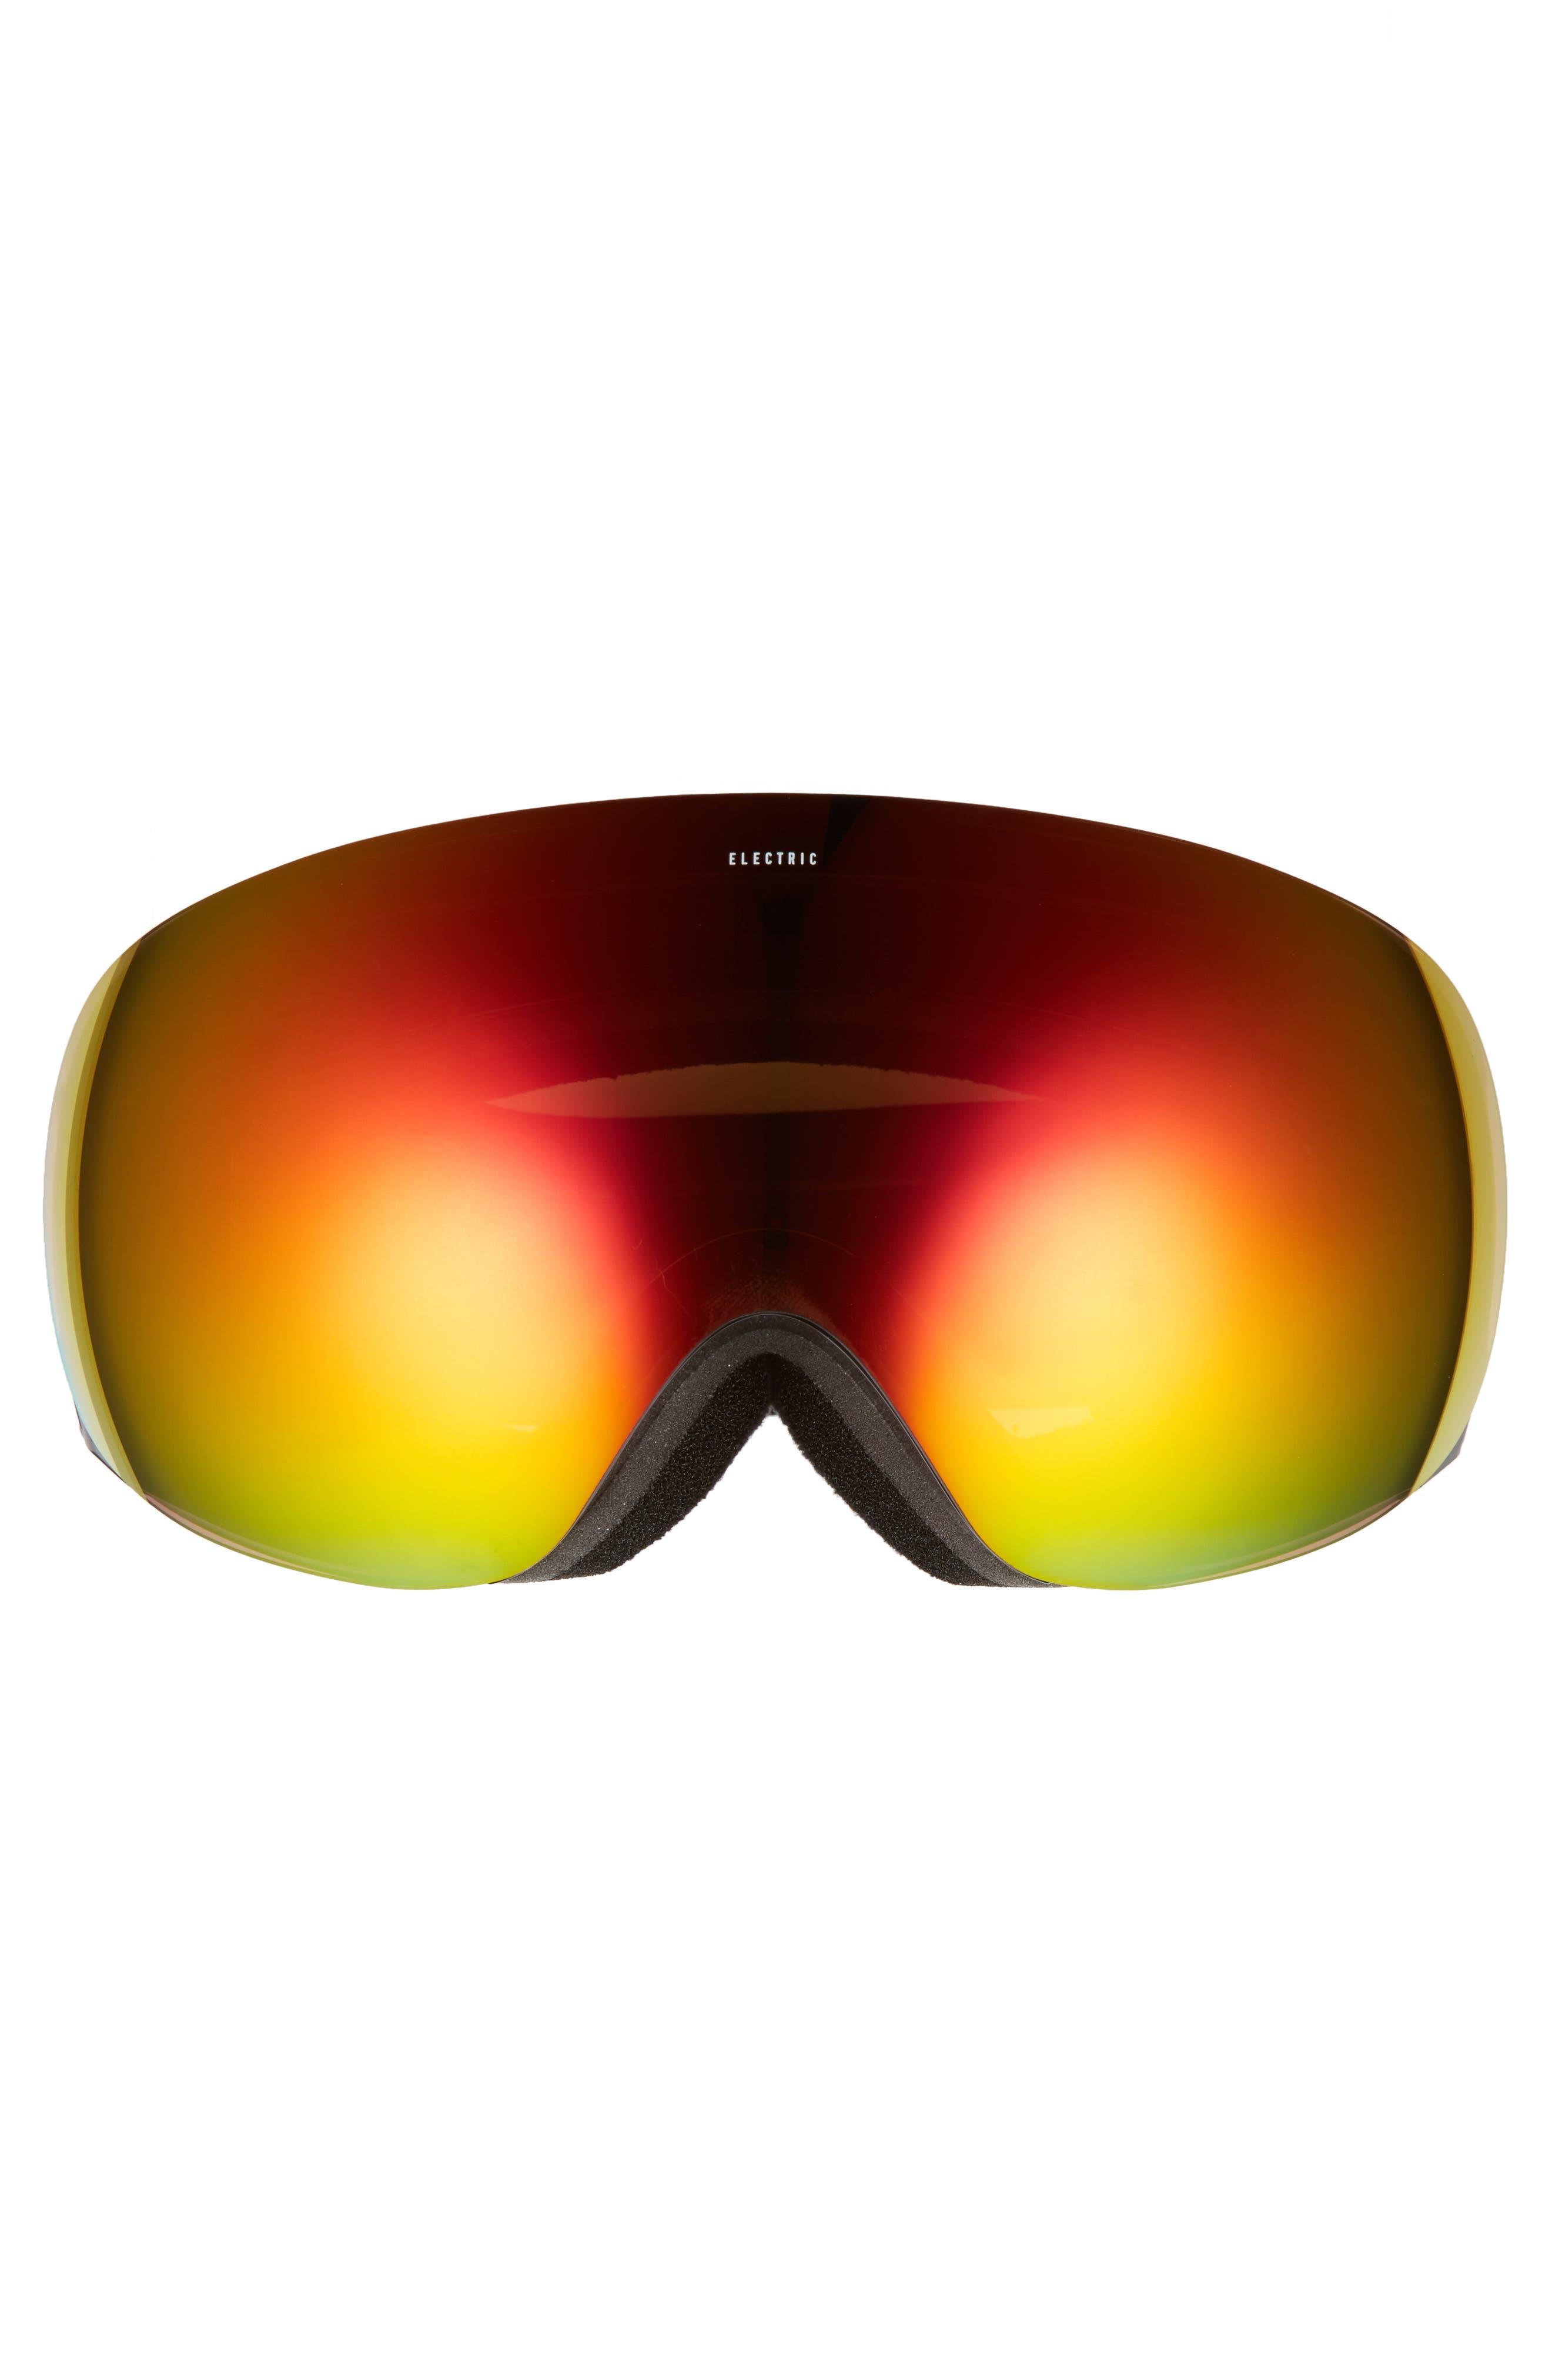 EG3.5 Snow Goggles,                             Alternate thumbnail 5, color,